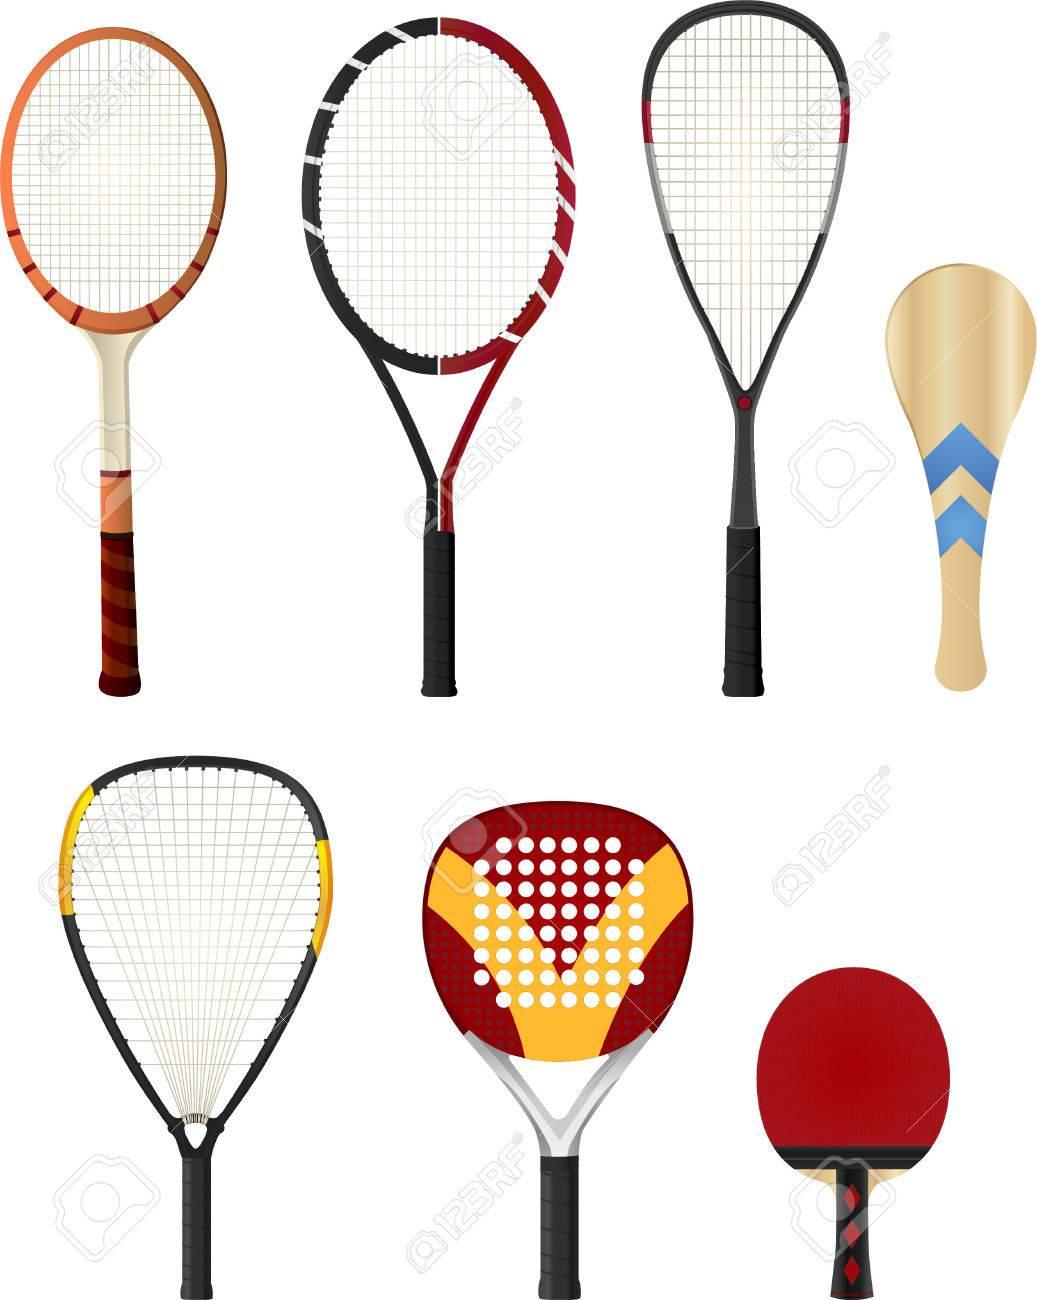 Raquetas De Color Silueta, Con Raqueta De Tenis, Raqueta De Squash ...